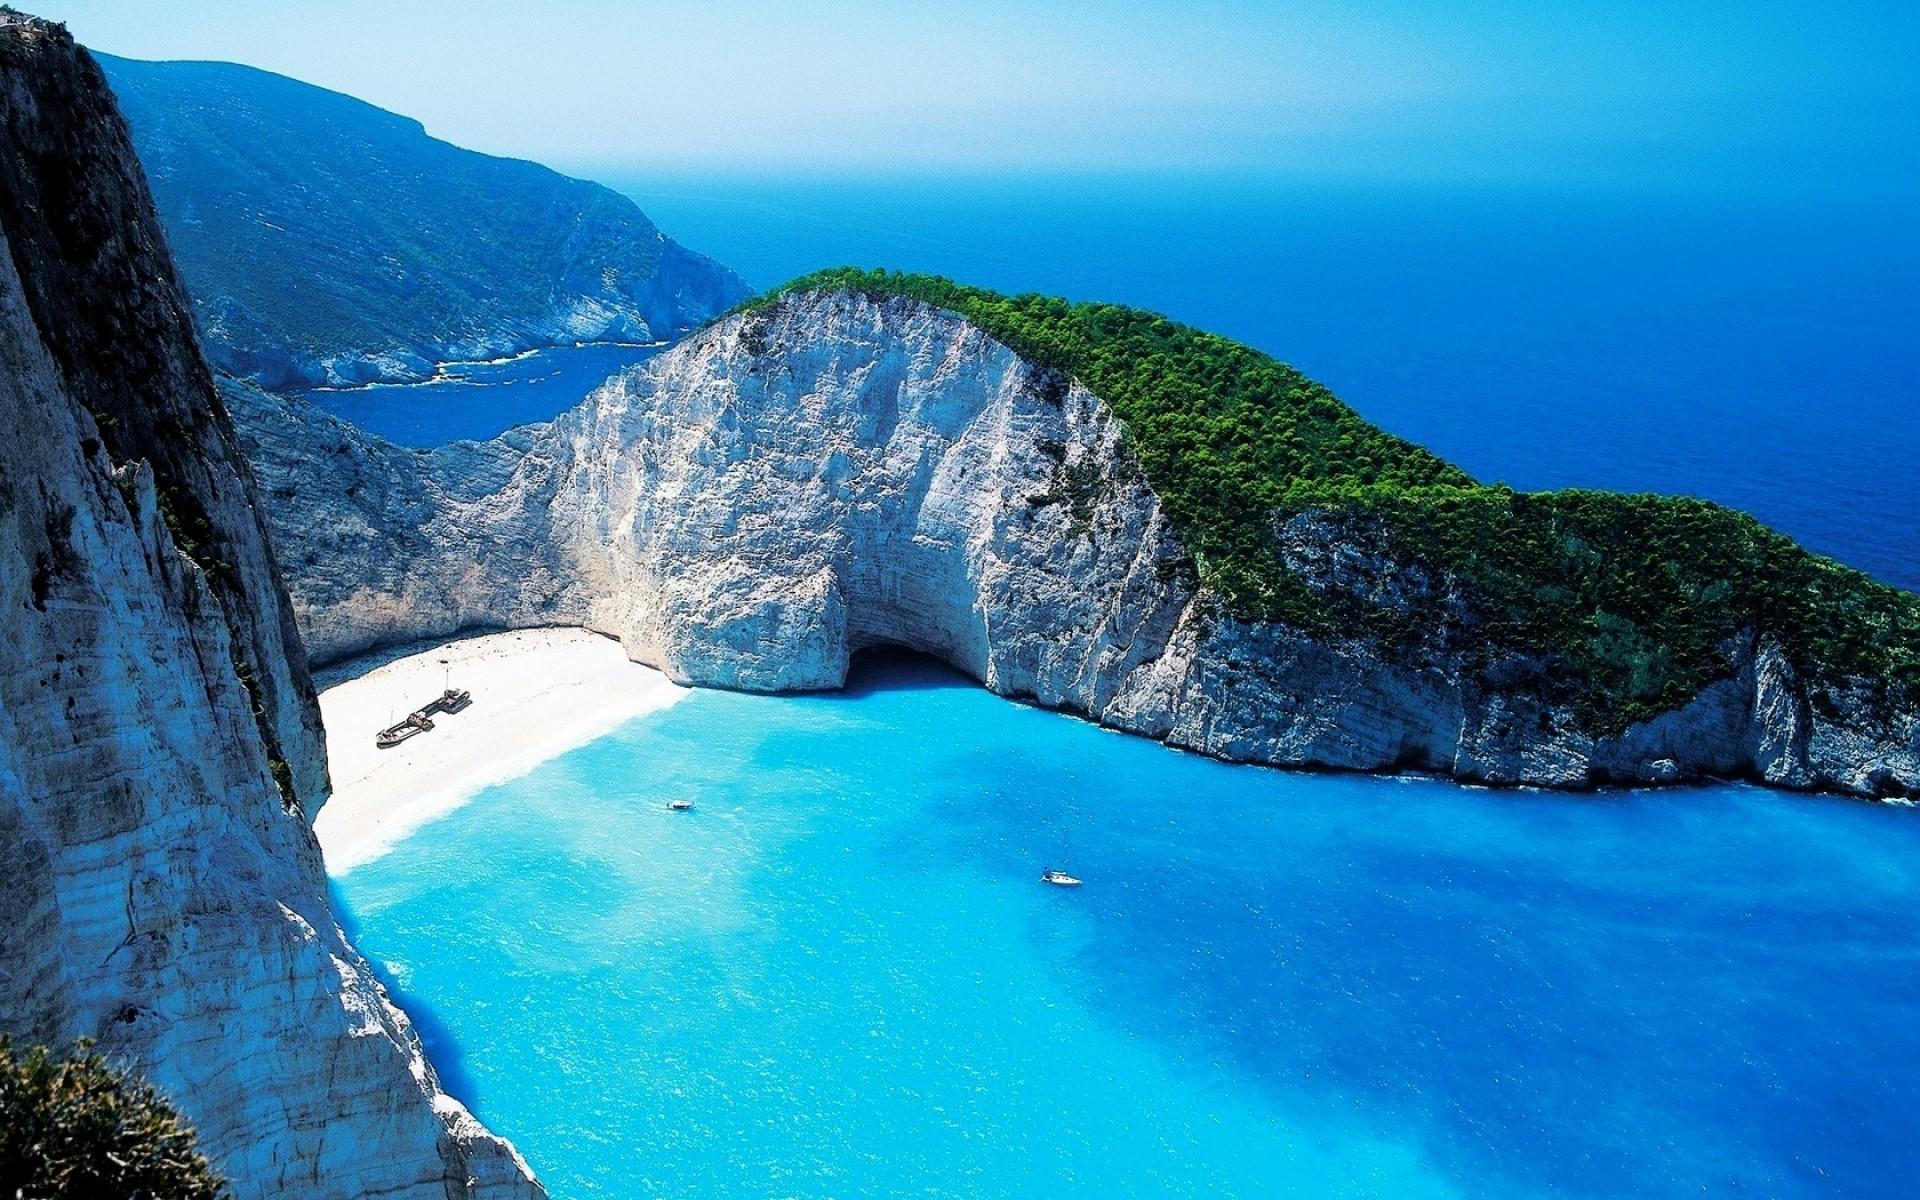 Ocean Desktop Backgrounds Free HD Wallpaper #6520   HD Wallpaper & 3D .